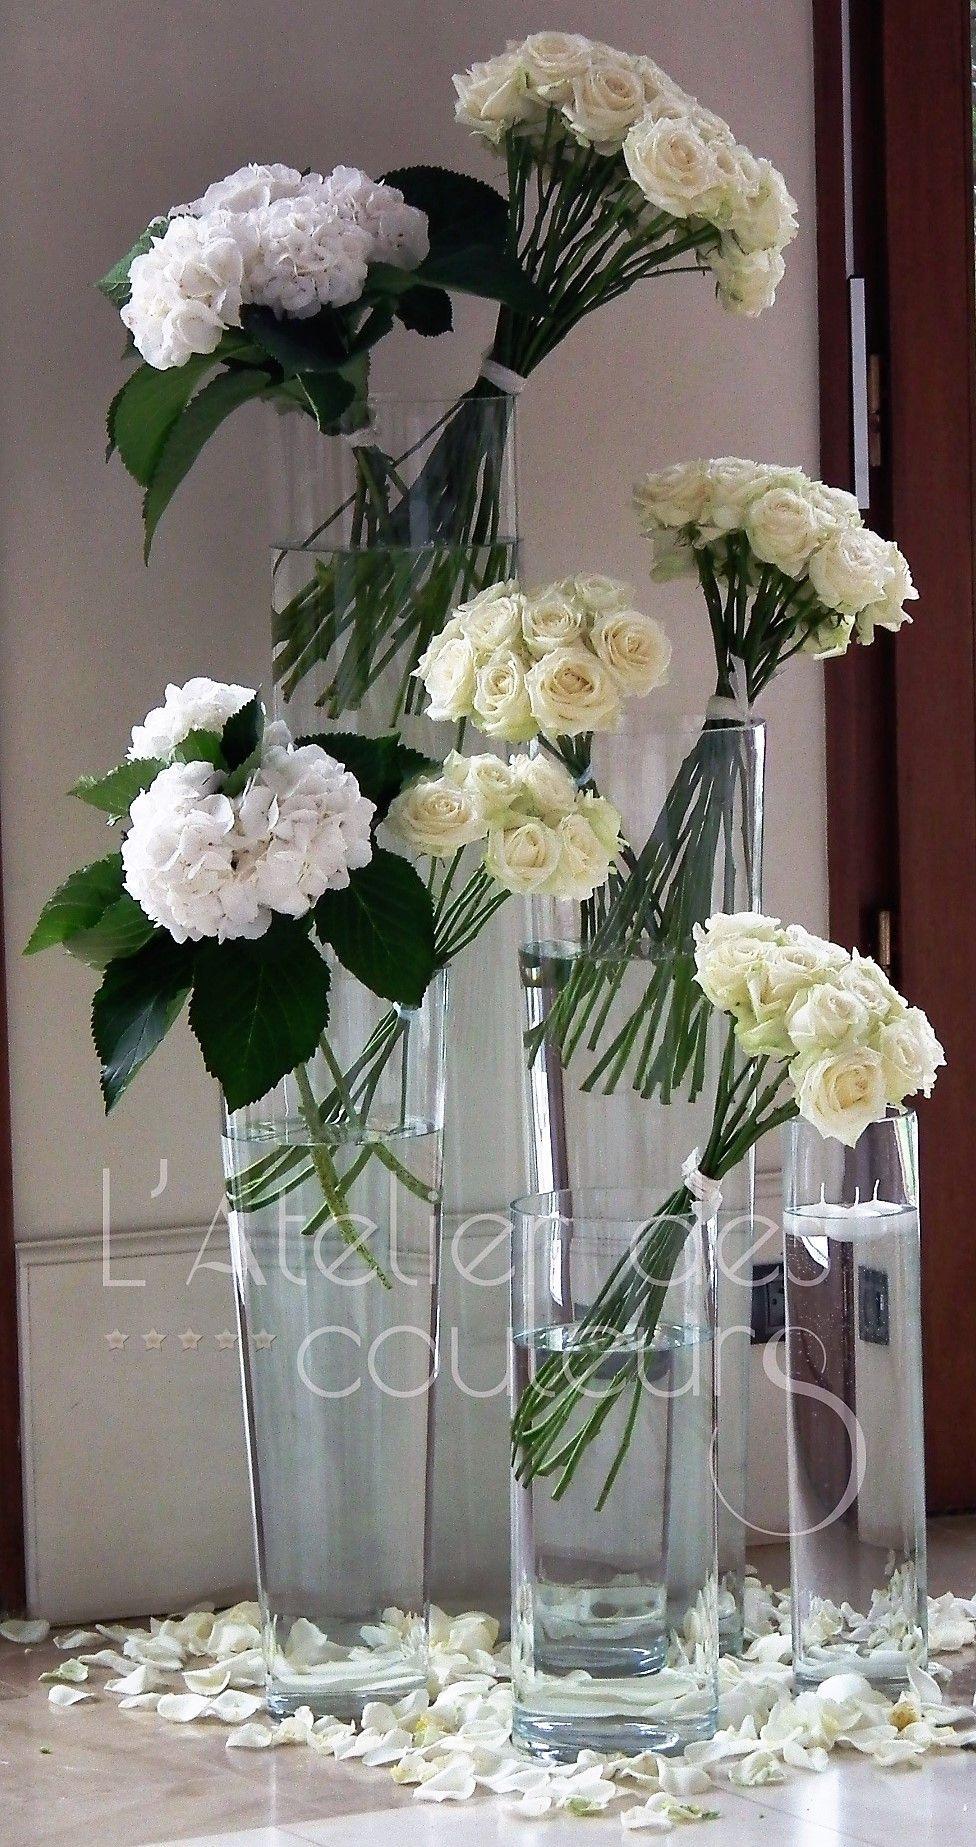 Modern White Rose Arrangement Wedding Flower Decoration Tall Glass Vase Wedding Flower Decorations Rose Arrangements Tall Glass Vases